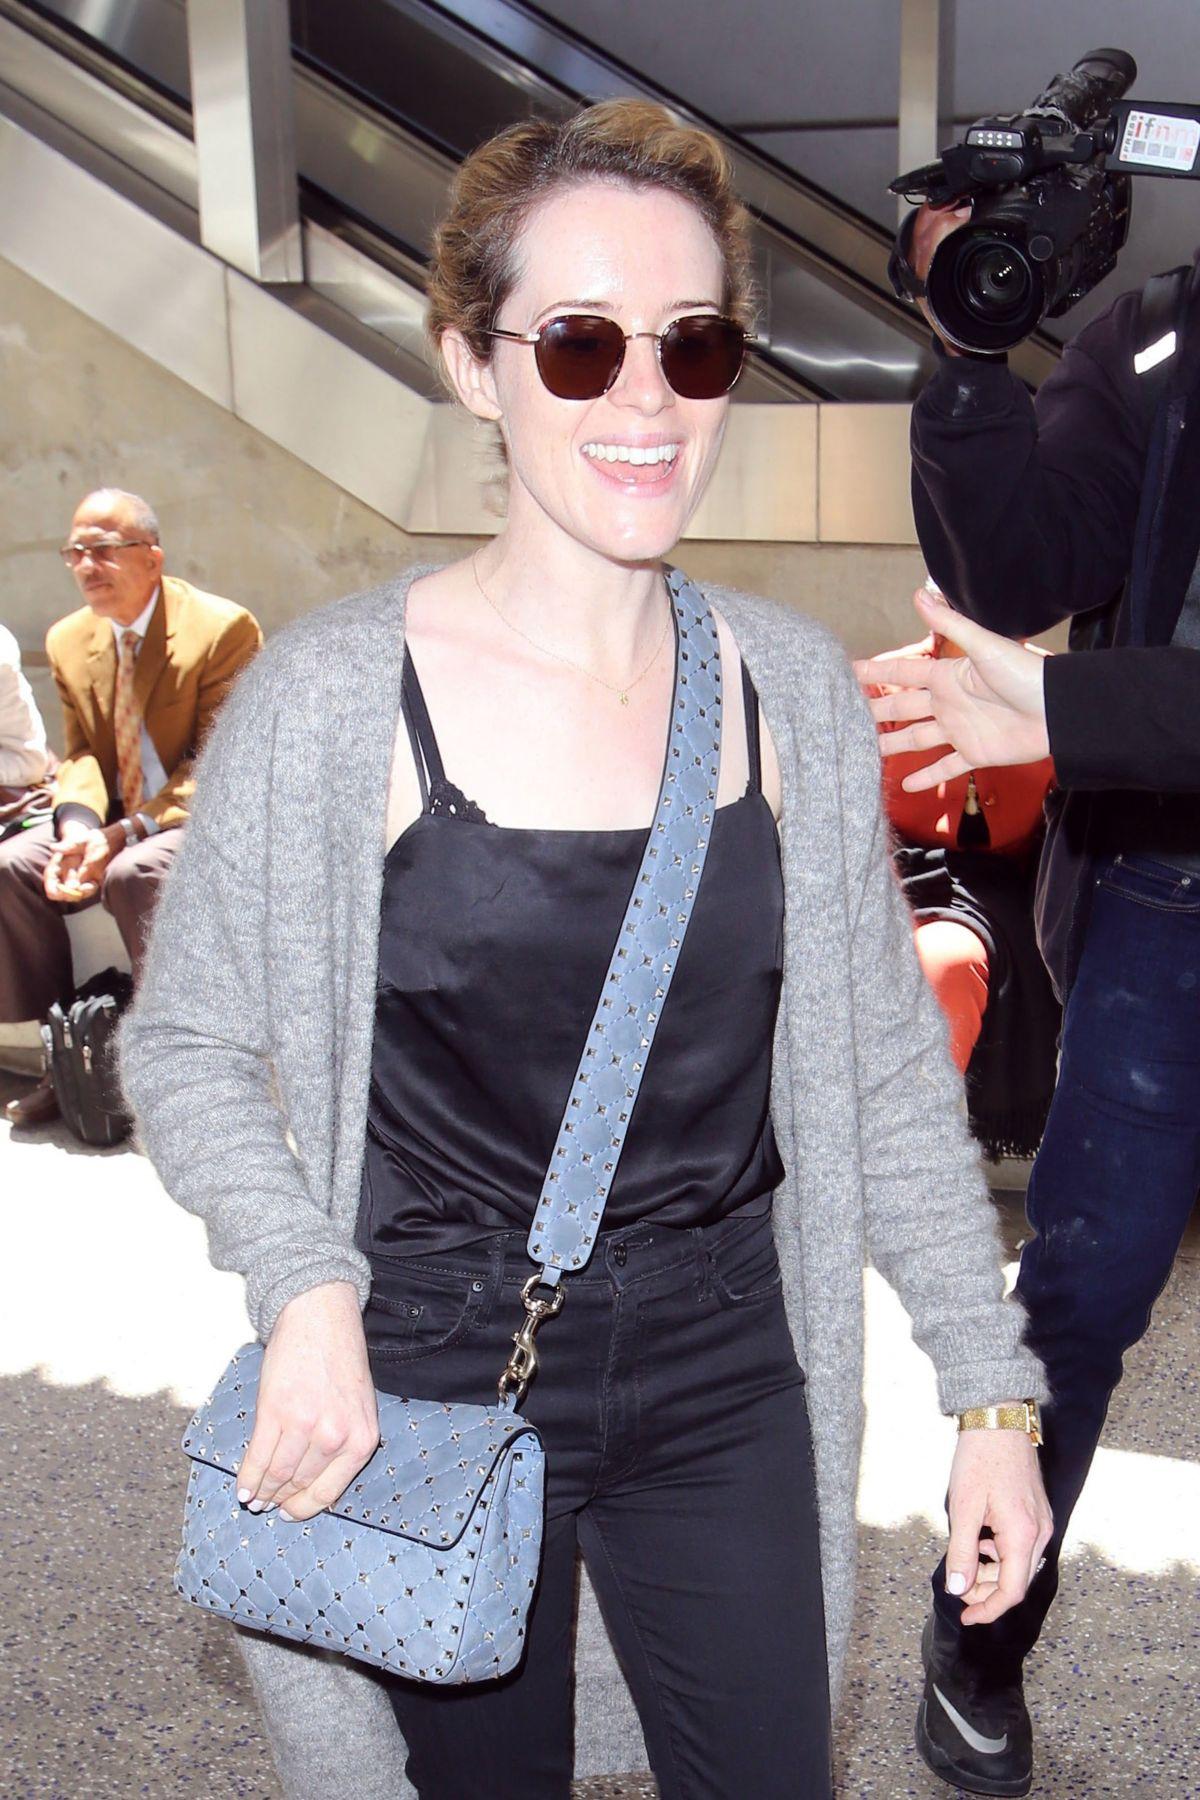 ALYSSA MILANO at Los Angeles International Airport 05/24/2017